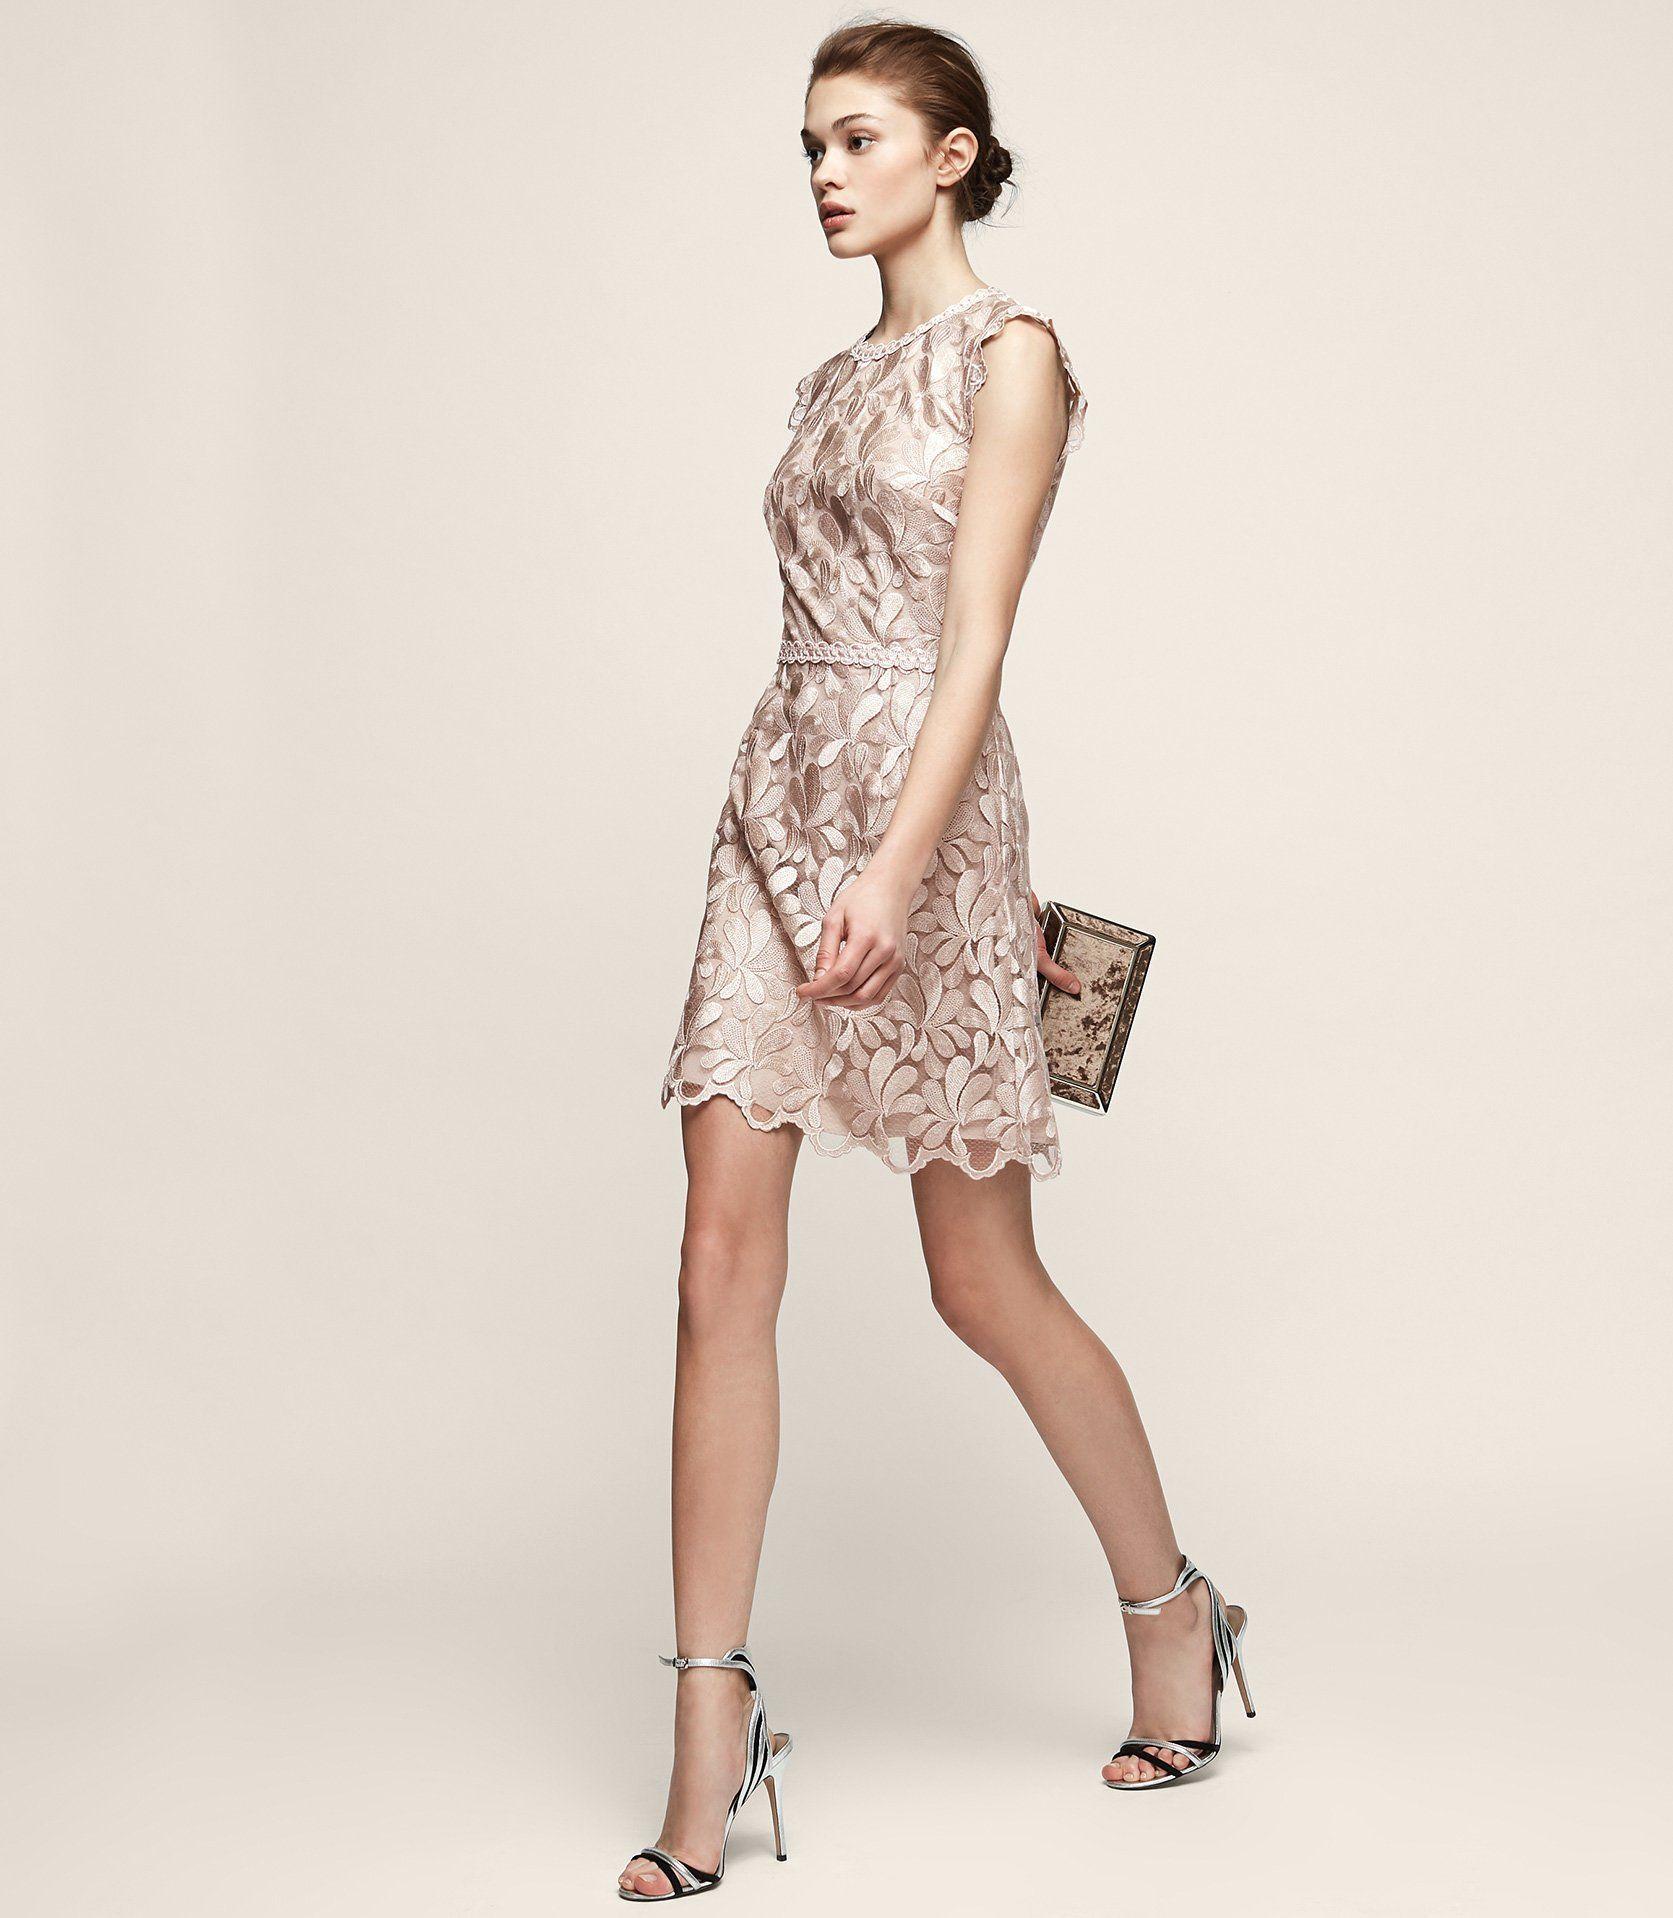 53dde238672 Sami Lace Open-Back Dress  ad - REISS